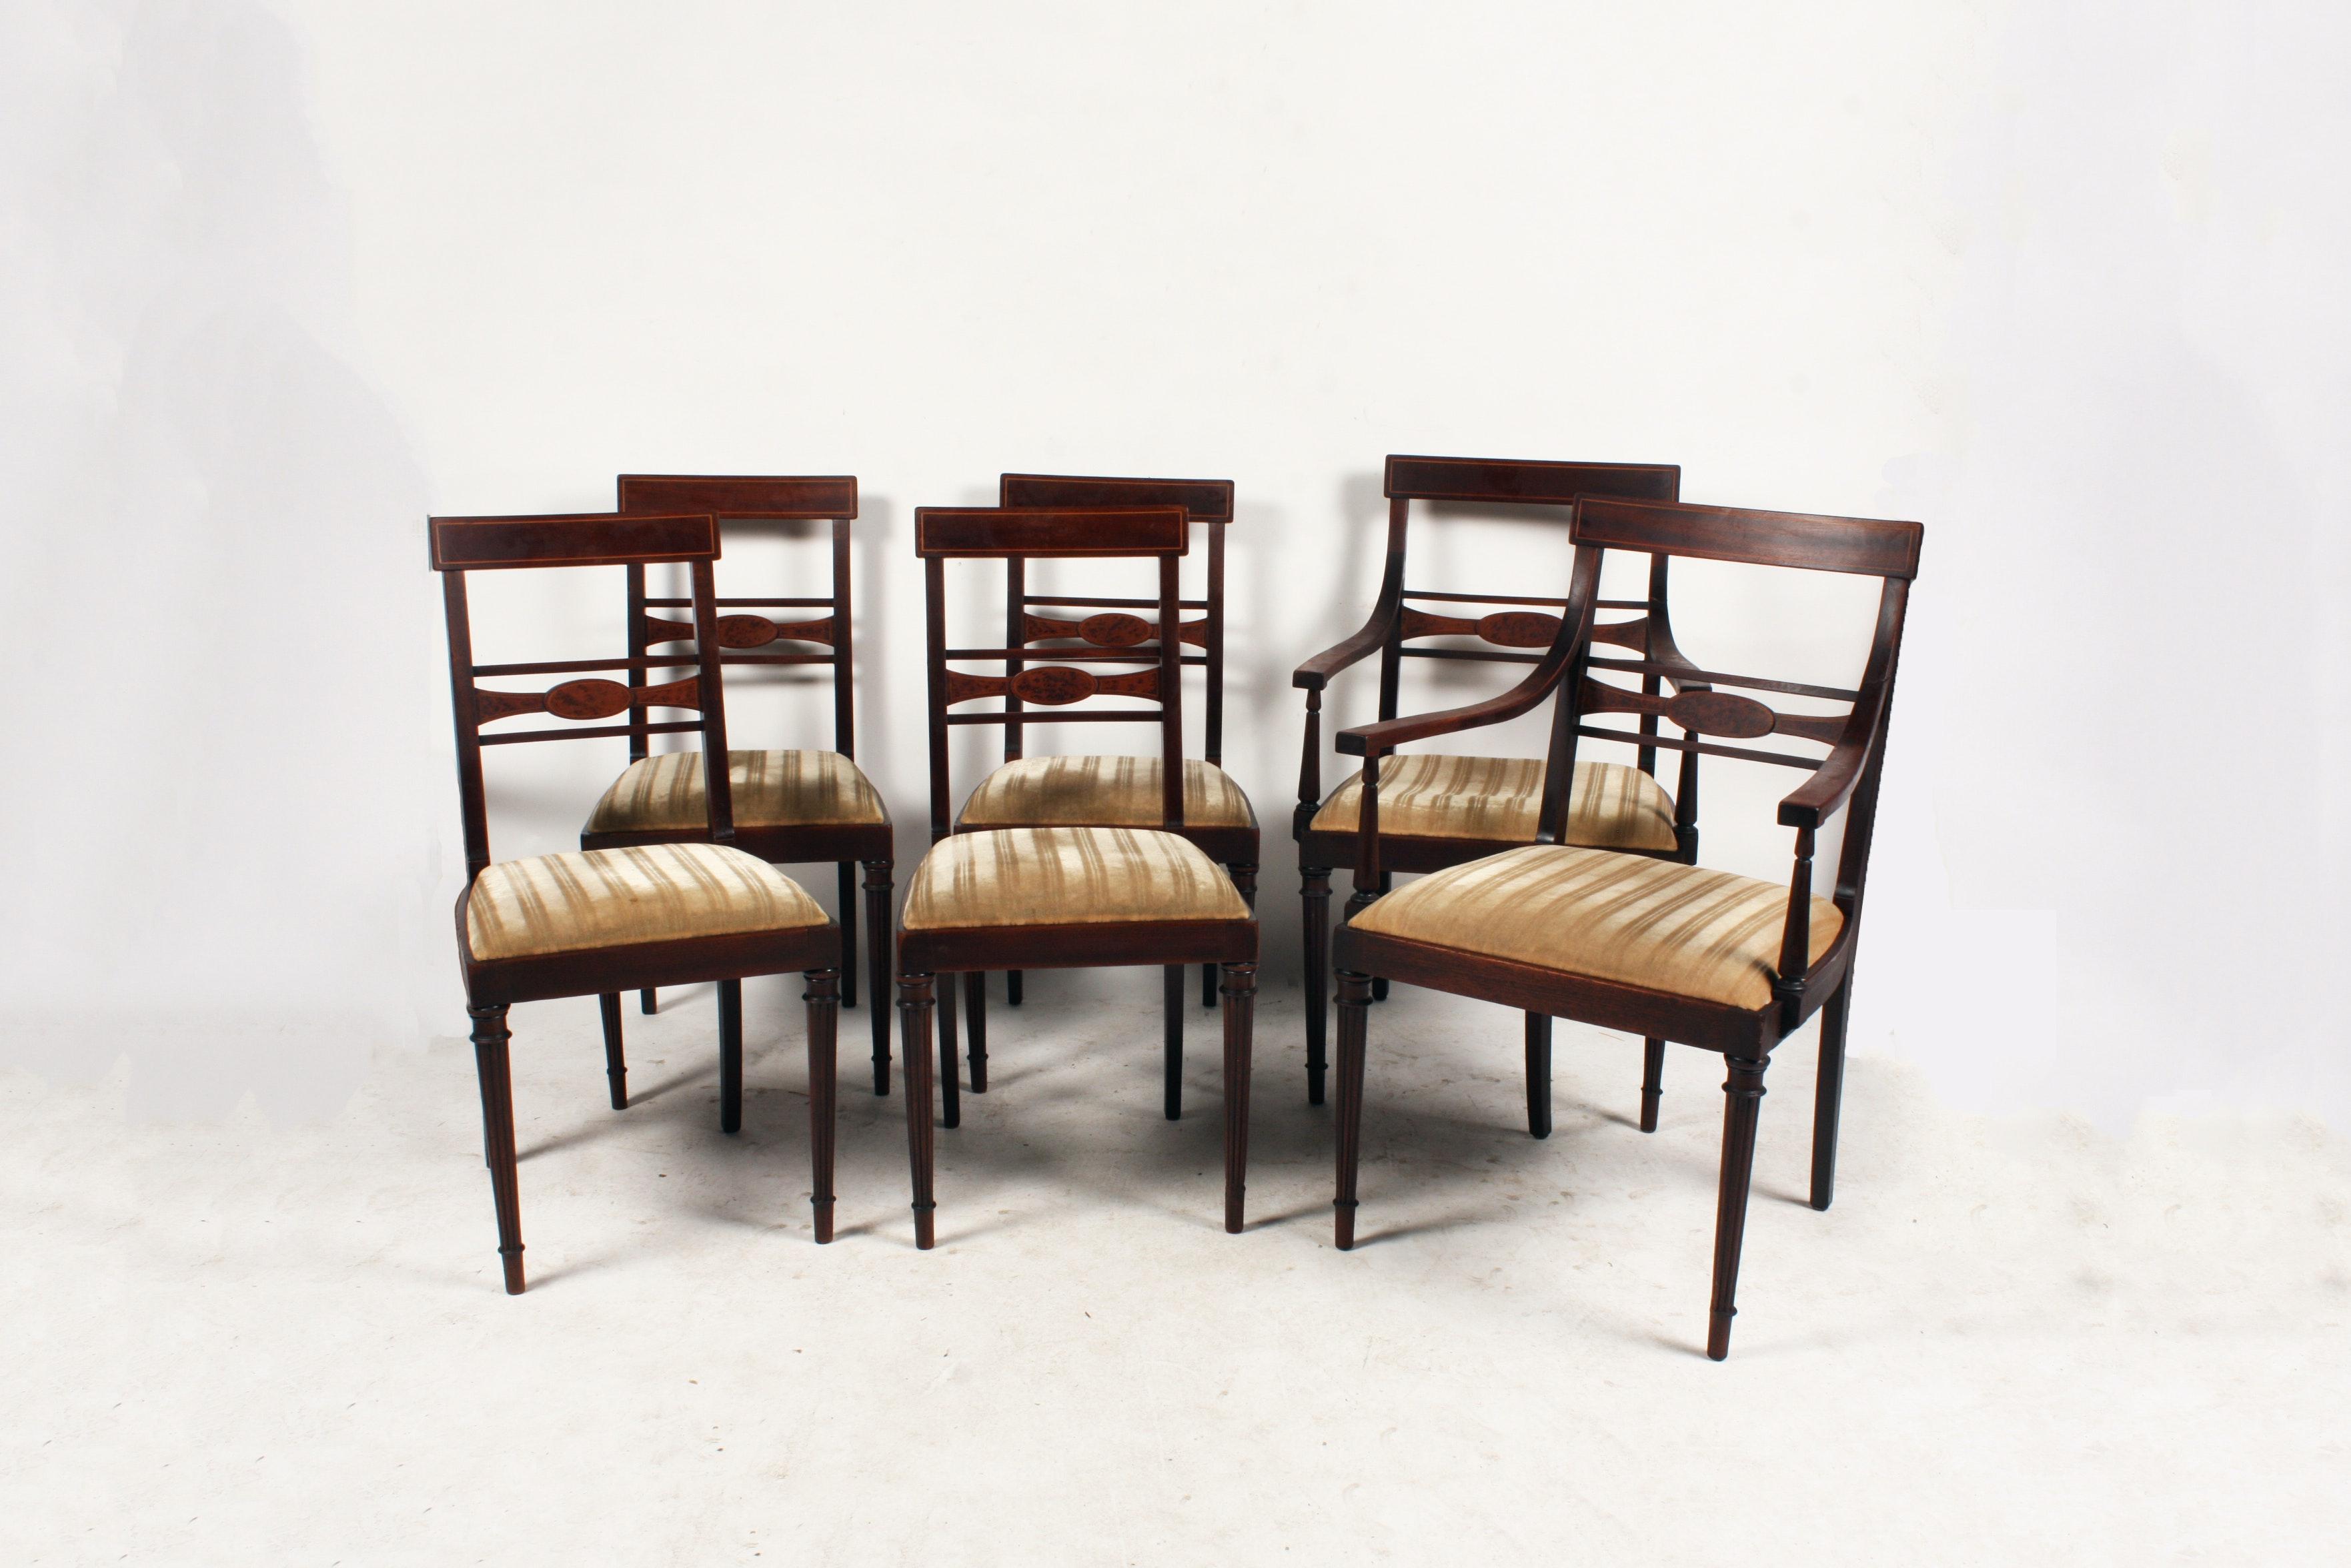 Set Of English Edwardian Style Dining Chairs ...